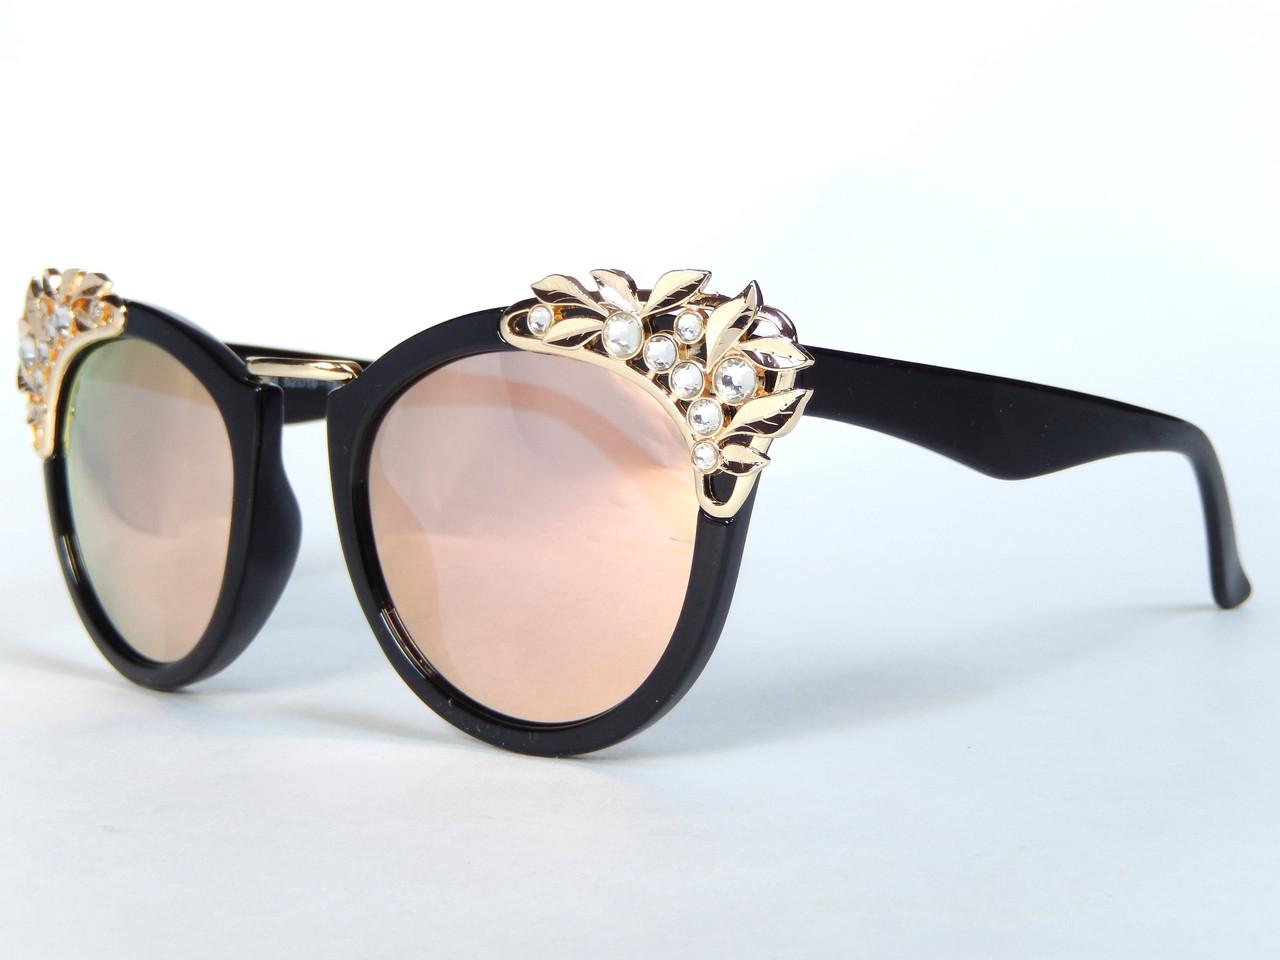 Солнцезащитные очки Elegant Metal Carving Leaves_rose gold